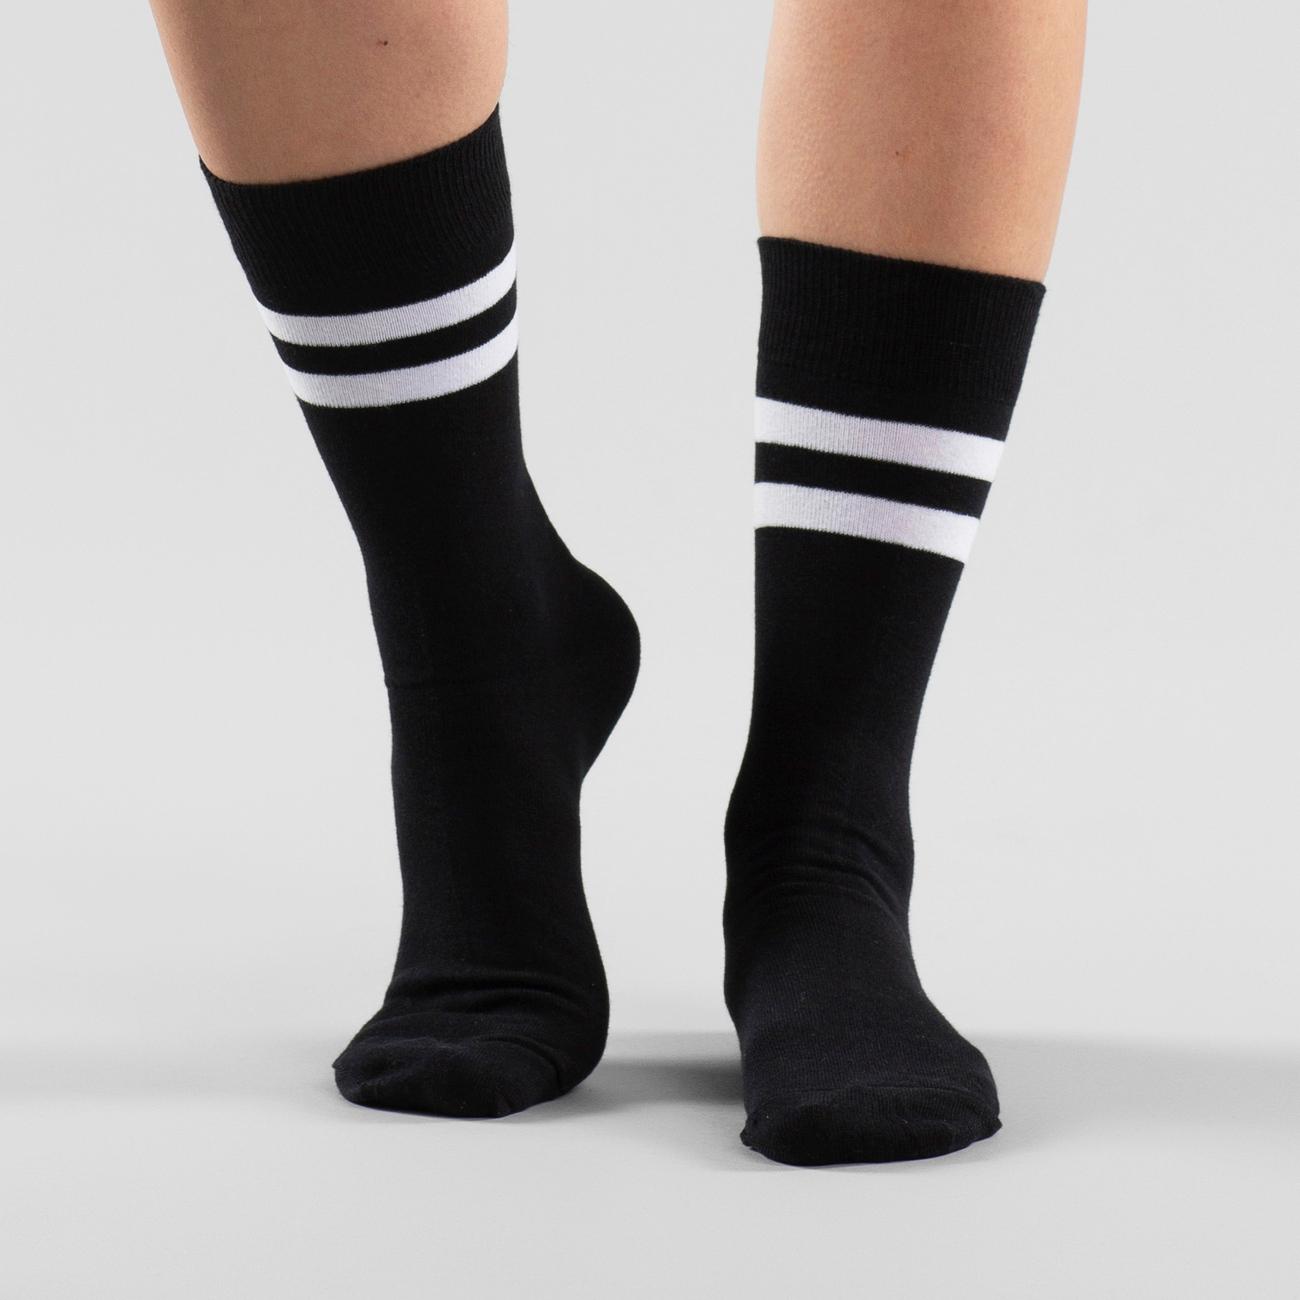 Socks Double Stripes